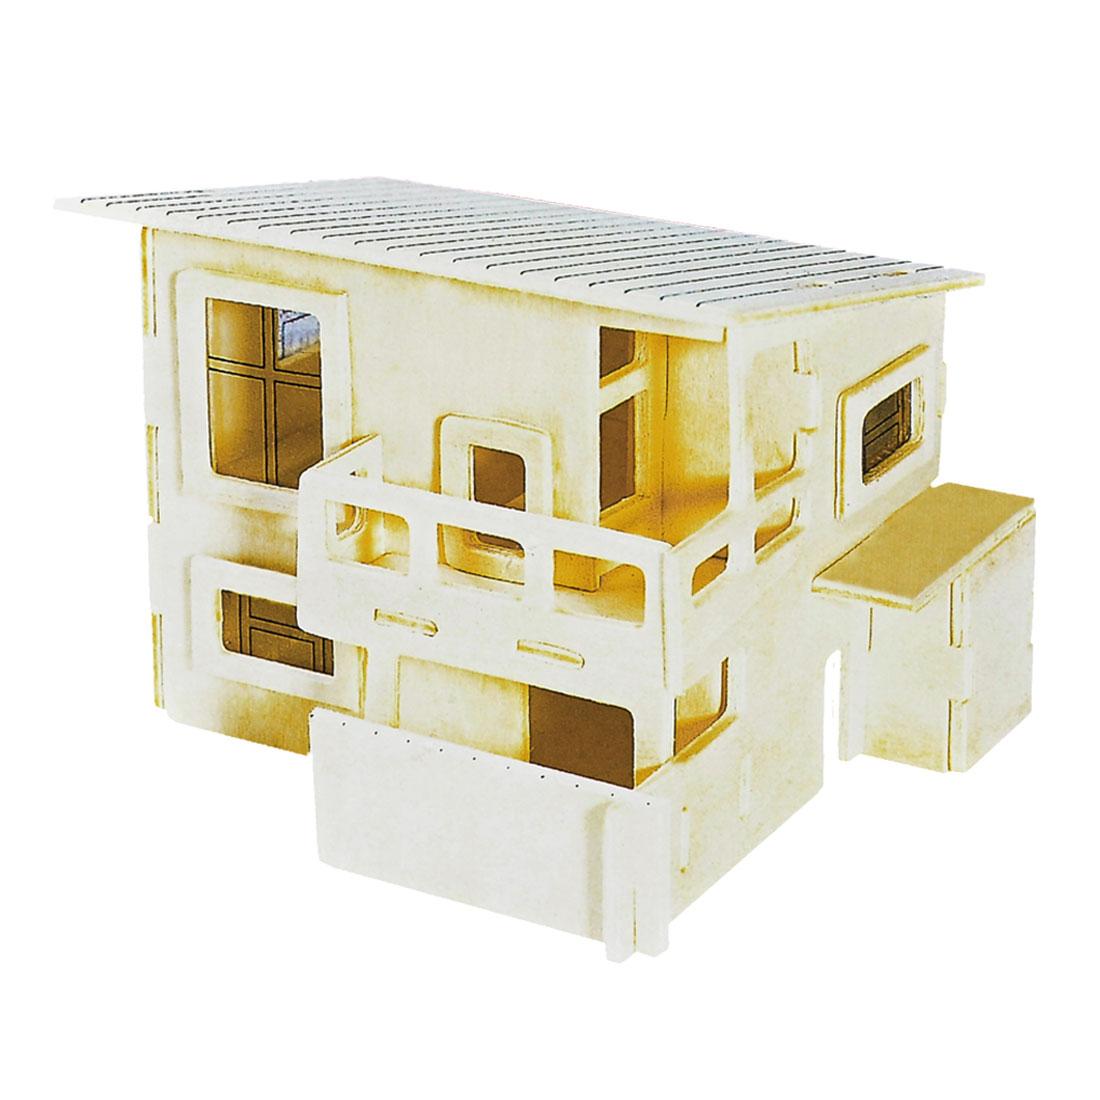 Child 3D Wood Wateitaku Model Woodcraft Construction Kit Puzzle Toy